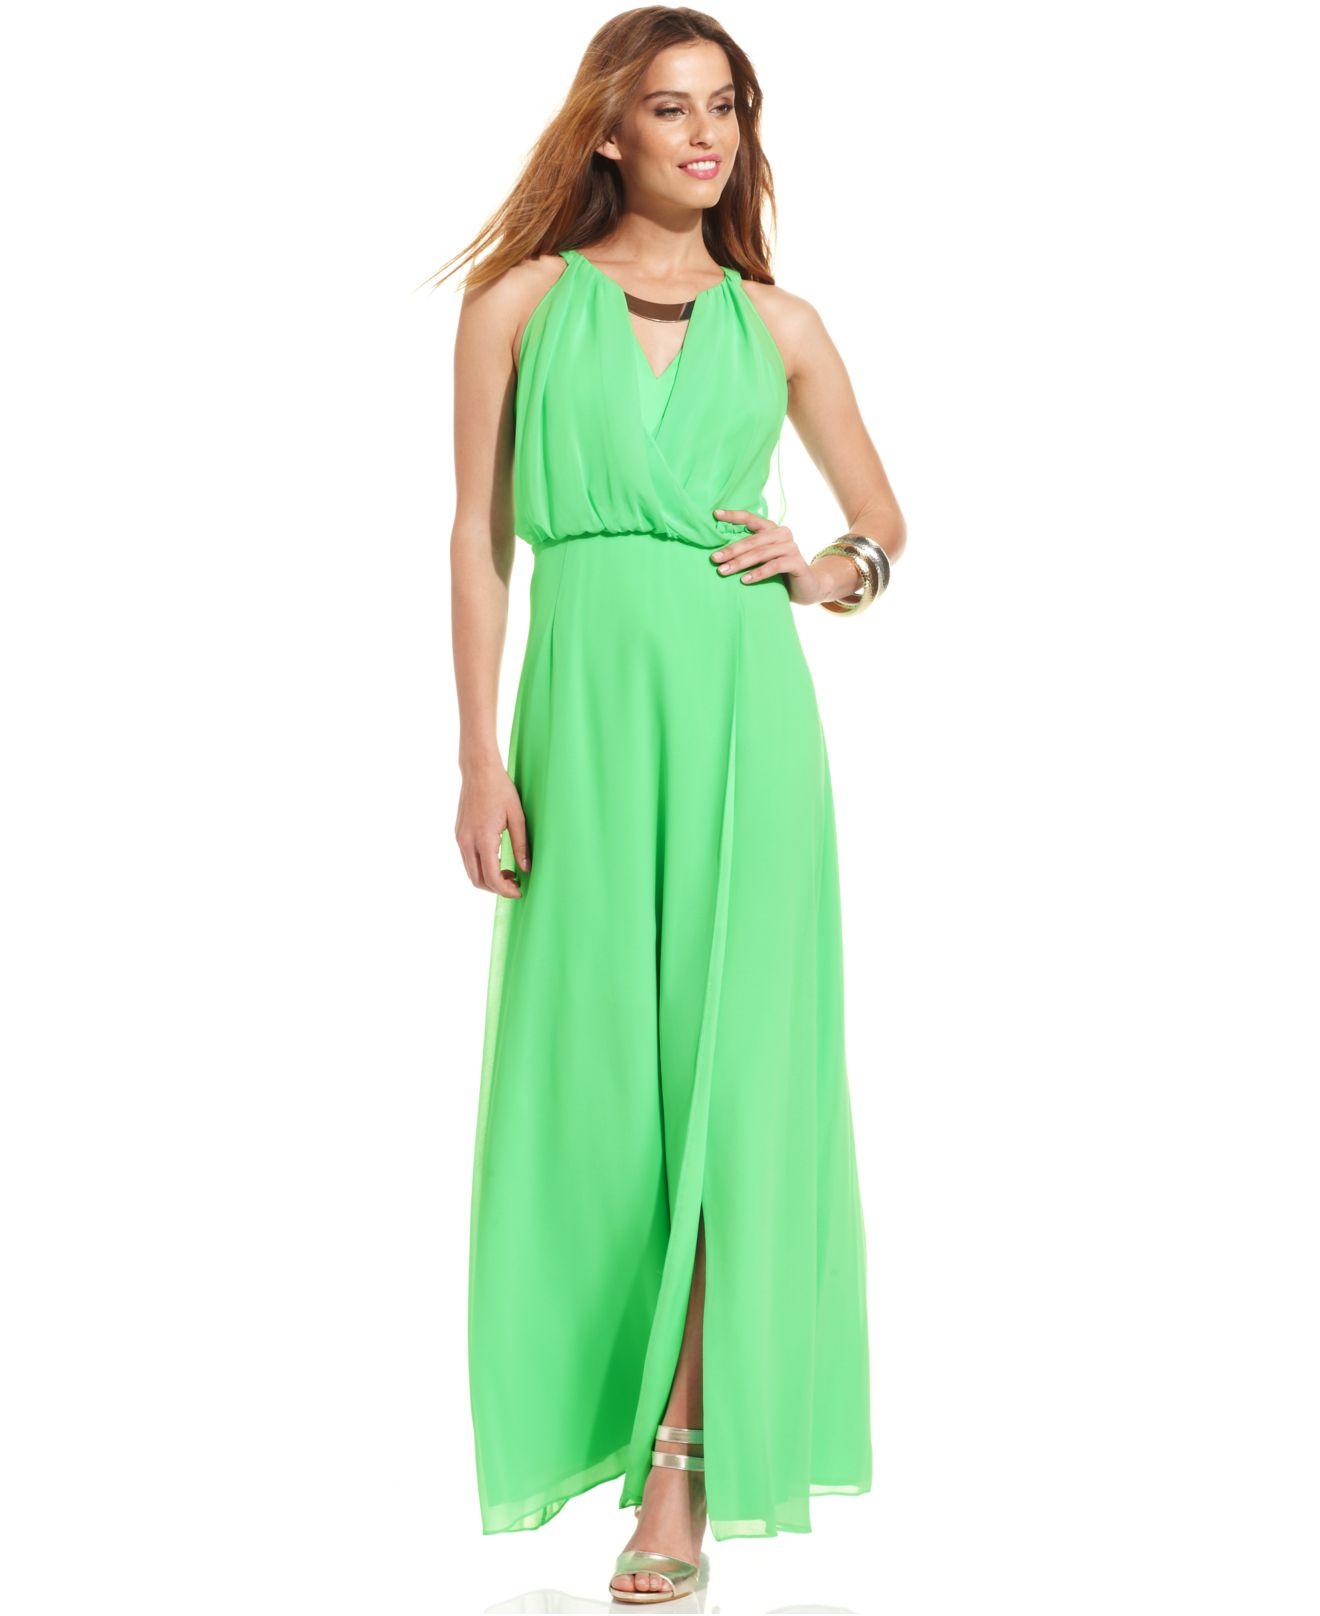 53c51683701d5 Mint Green Bridesmaid Dresses Macys | Saddha